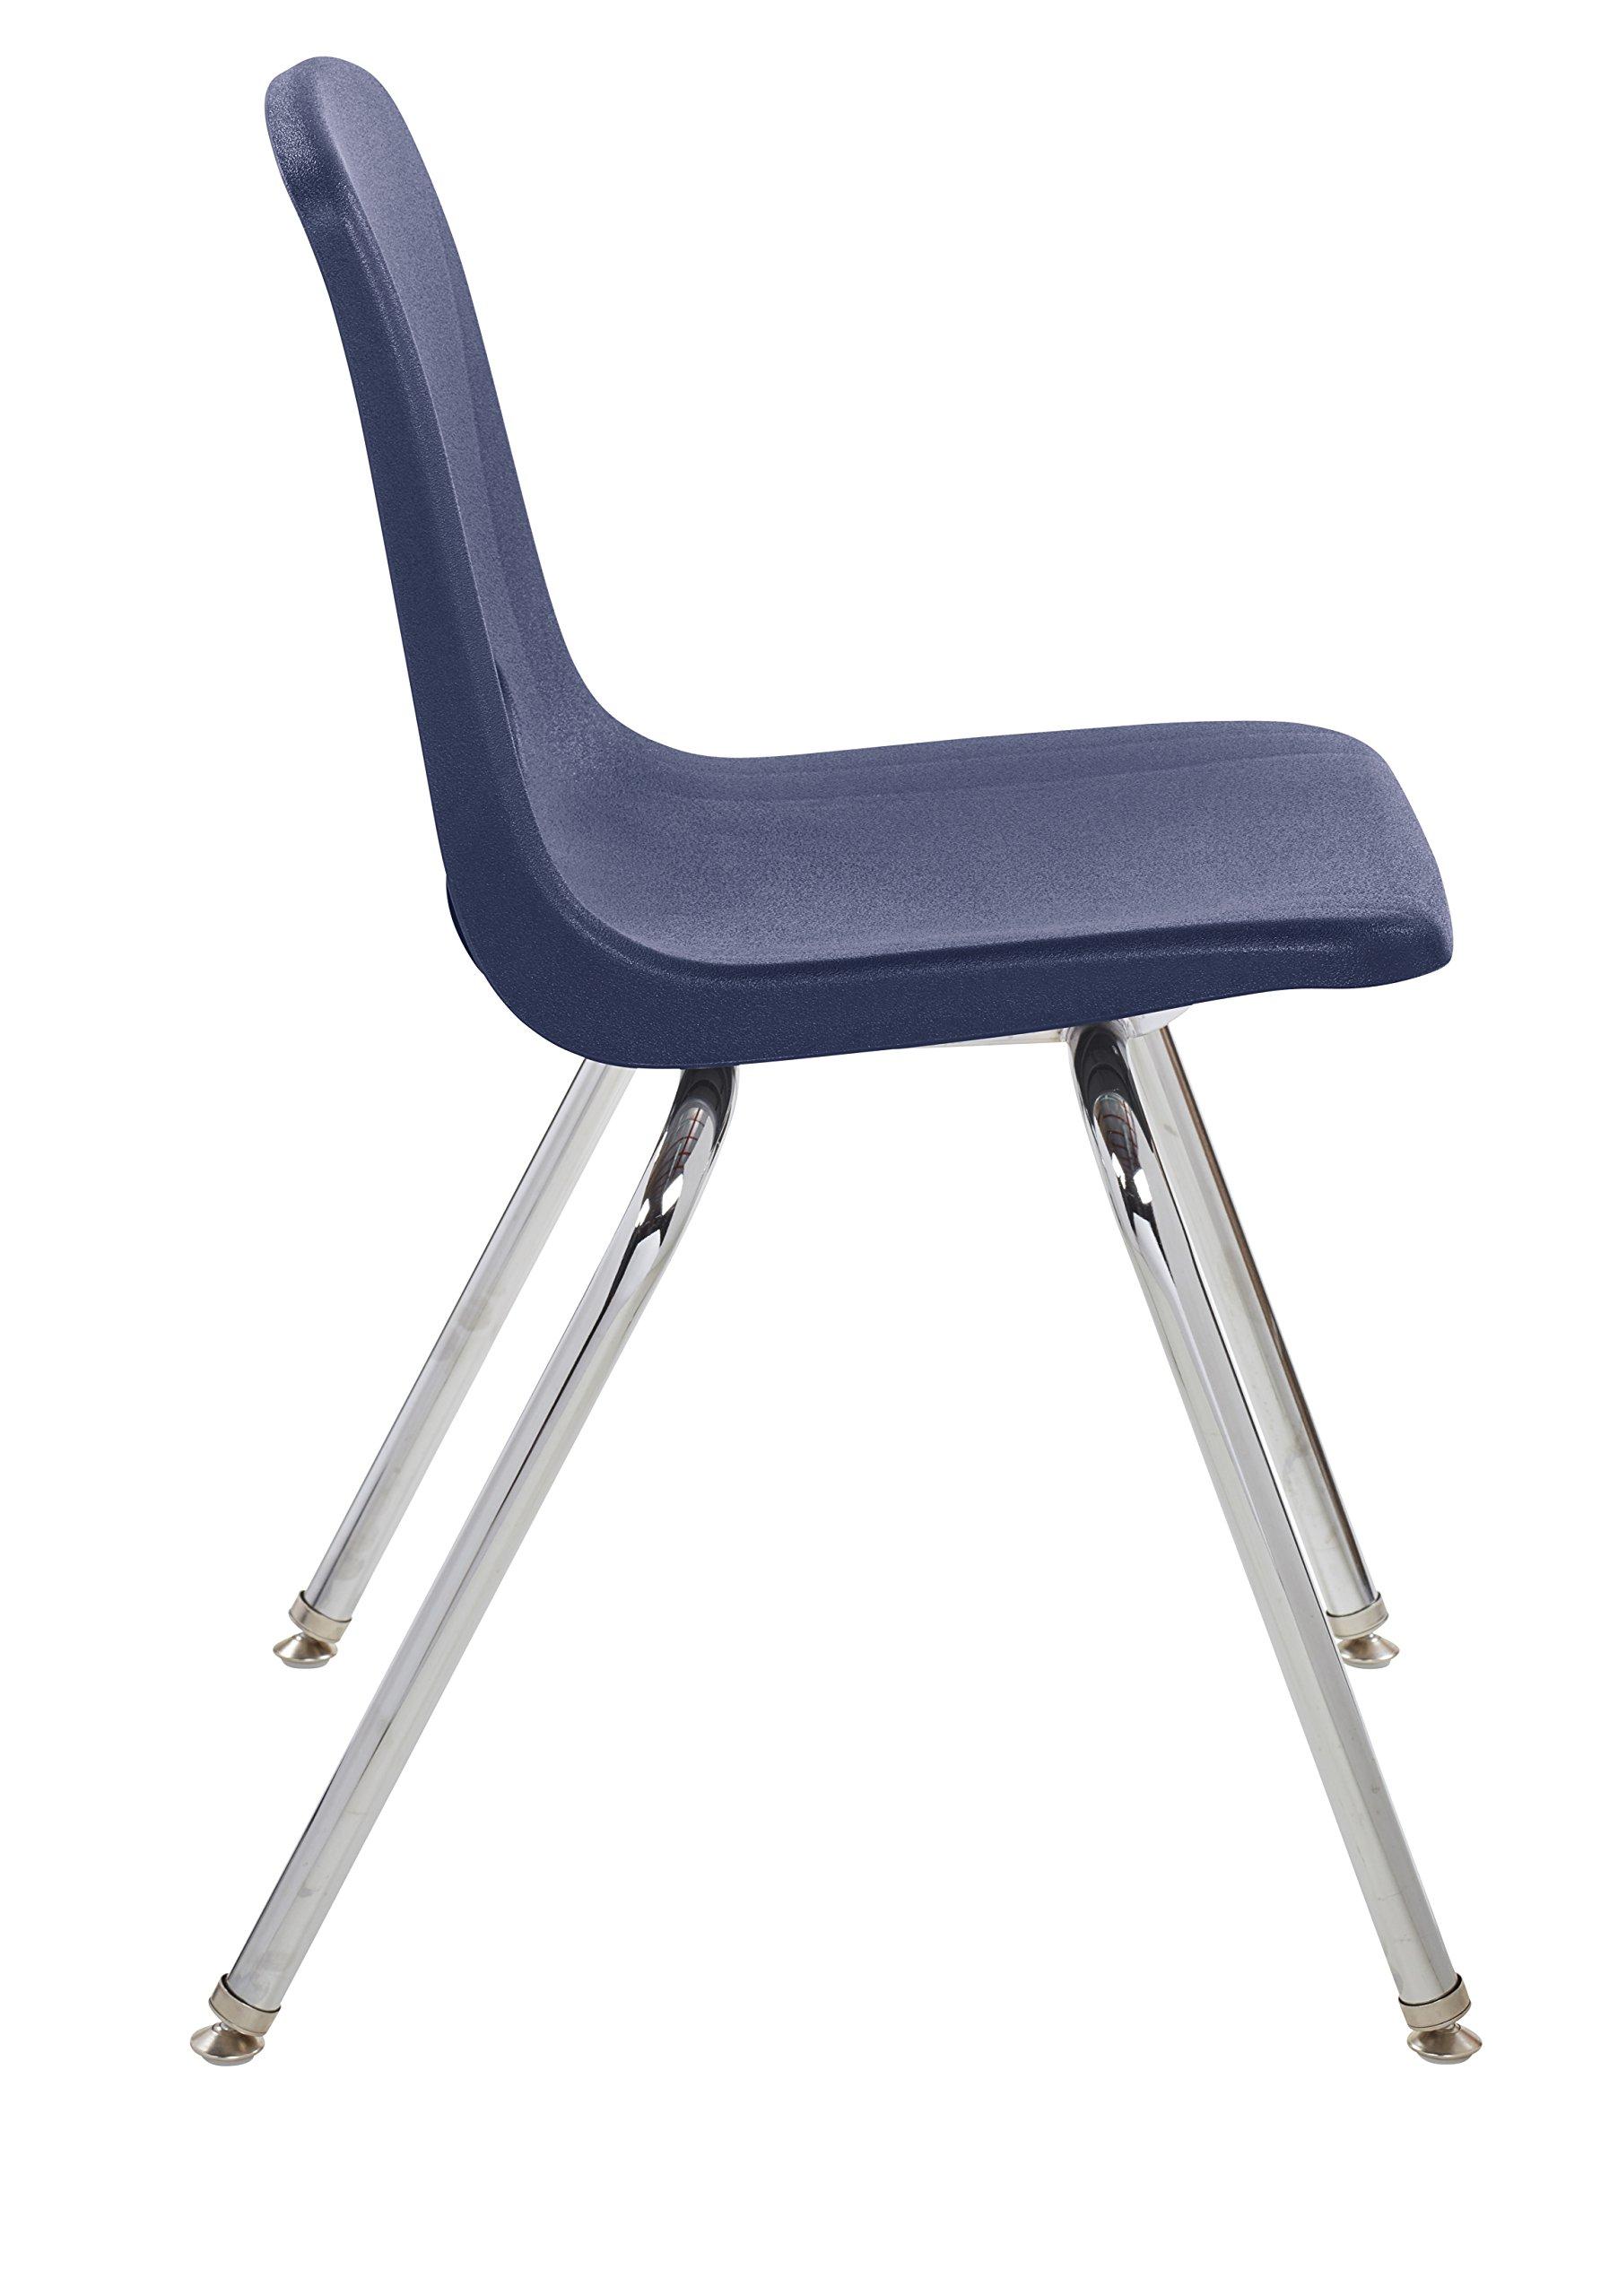 ECR4Kids 18'' School Stack Chair, Chrome Legs with Nylon Swivel Glides, Navy (5-Pack) by ECR4Kids (Image #3)